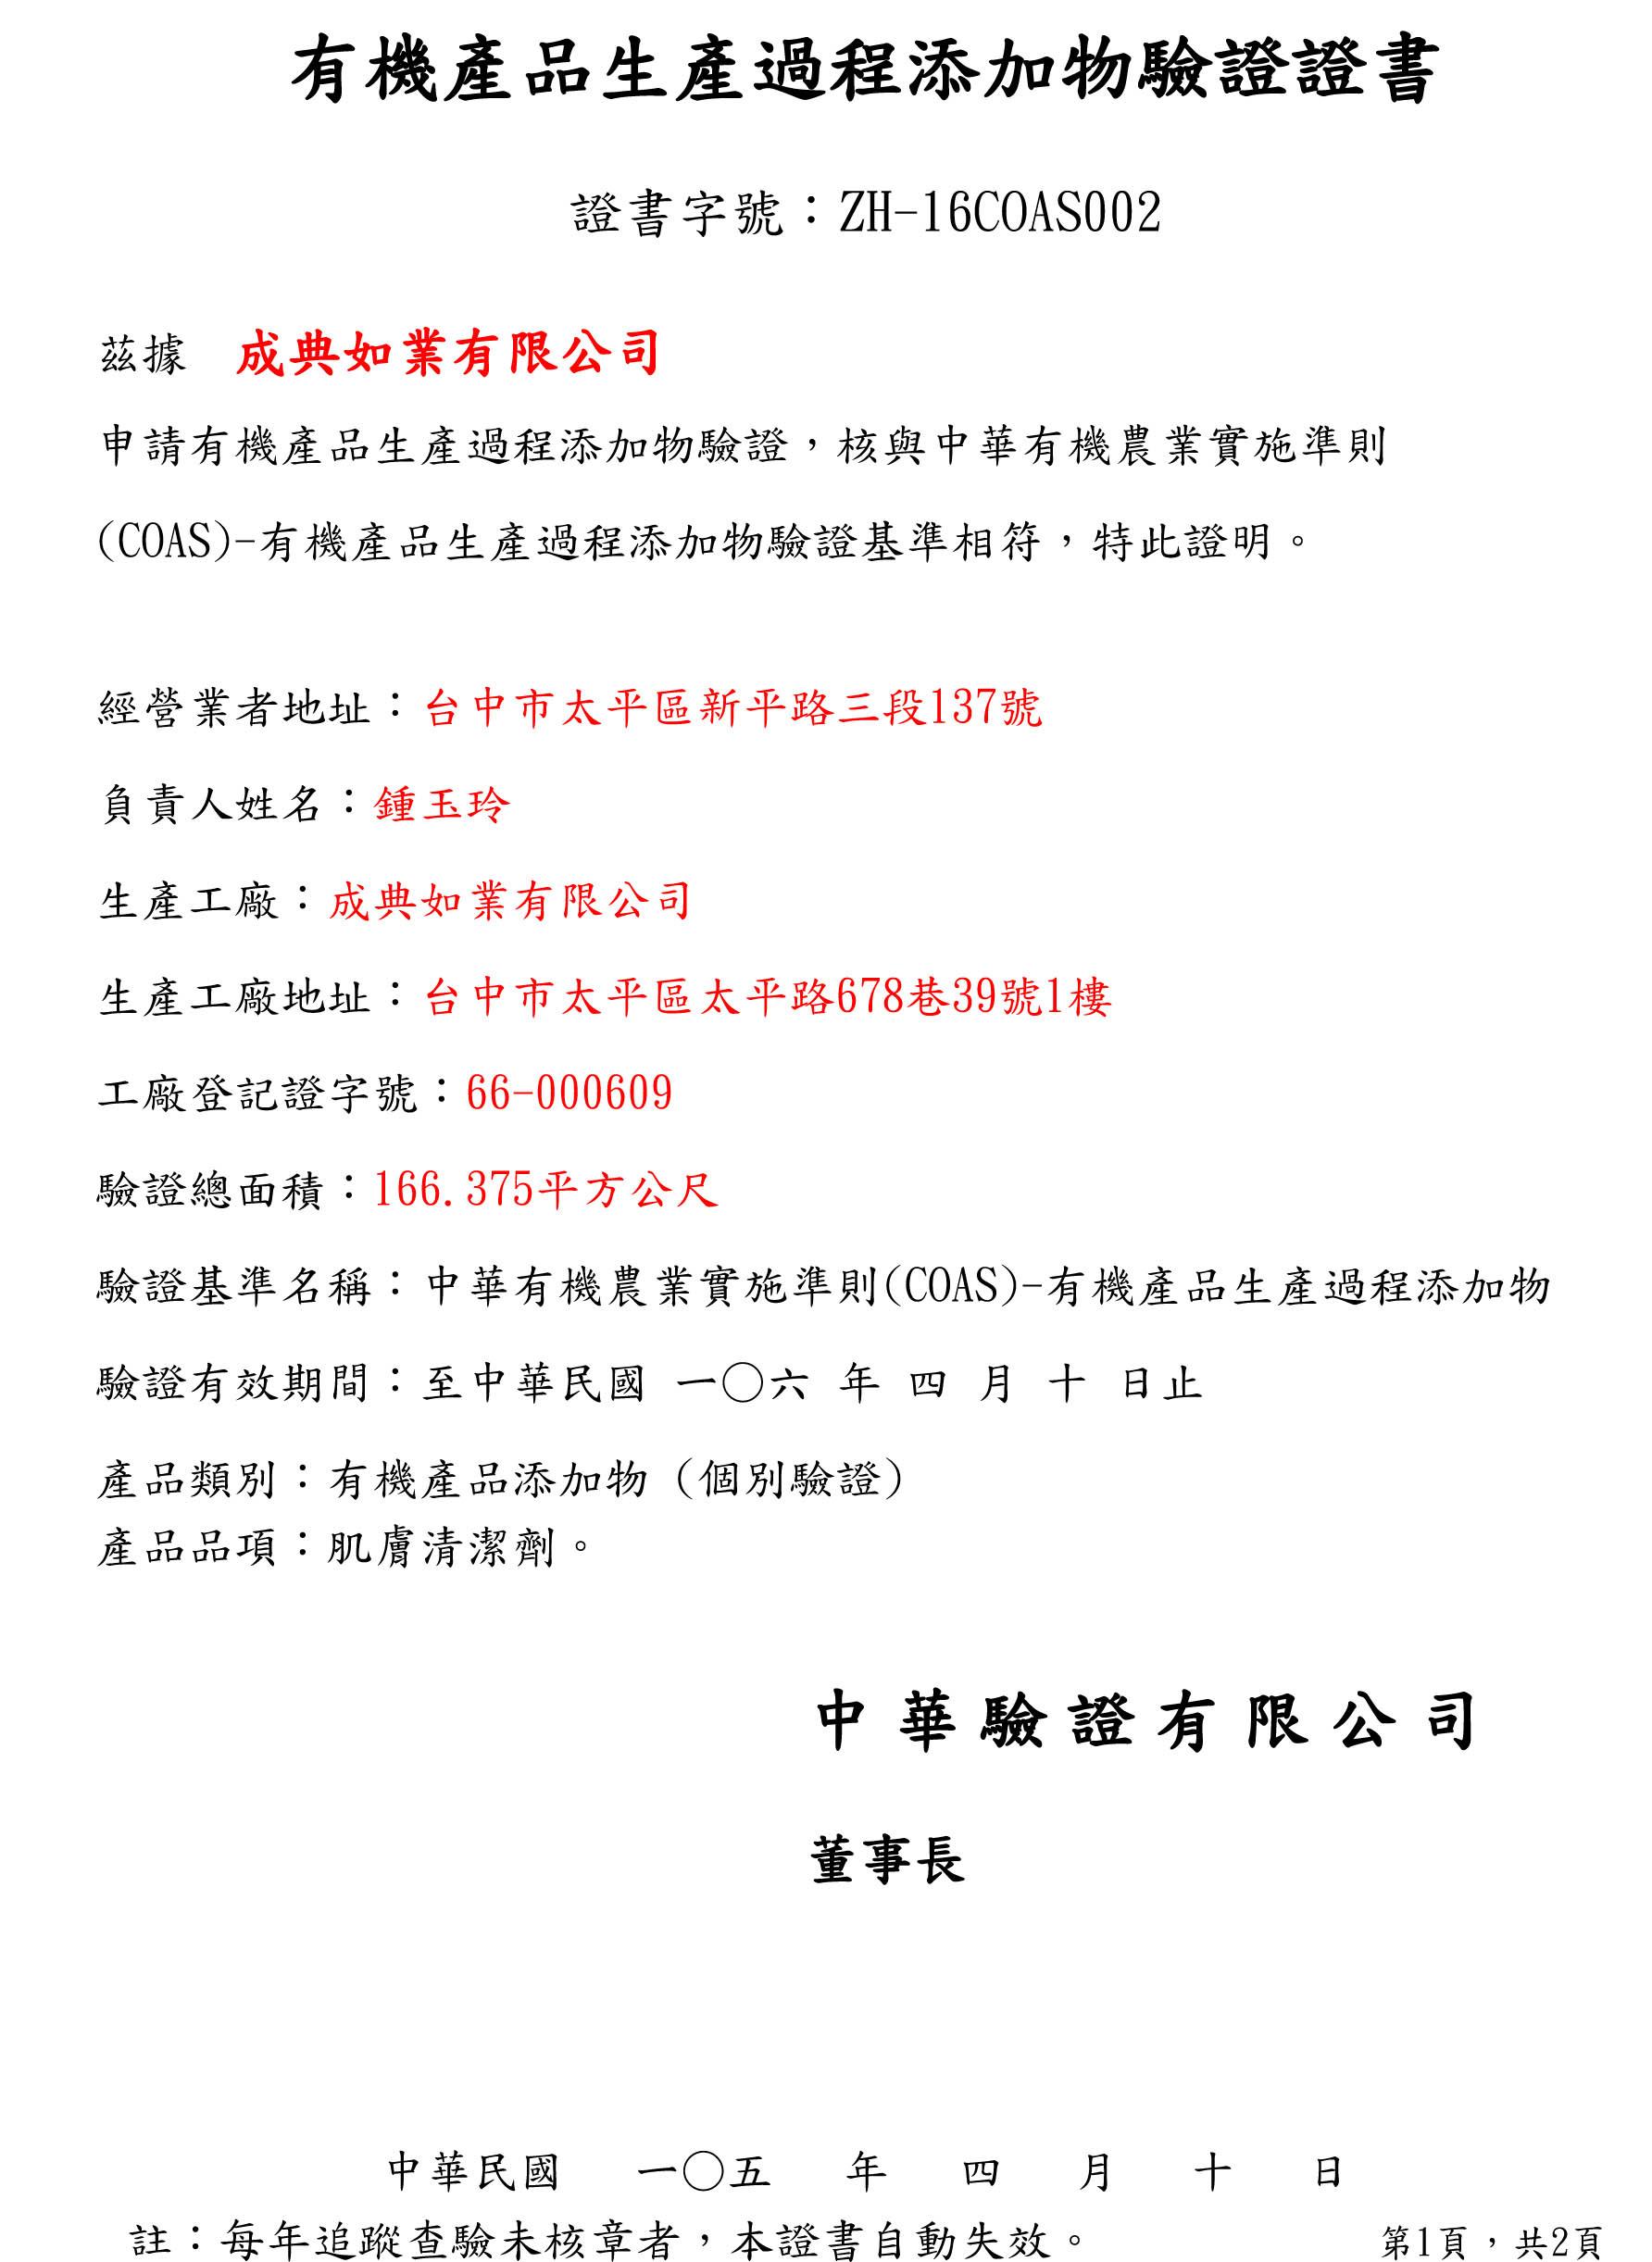 16COAS002成典如業有限公司證書--2016-04-11-1